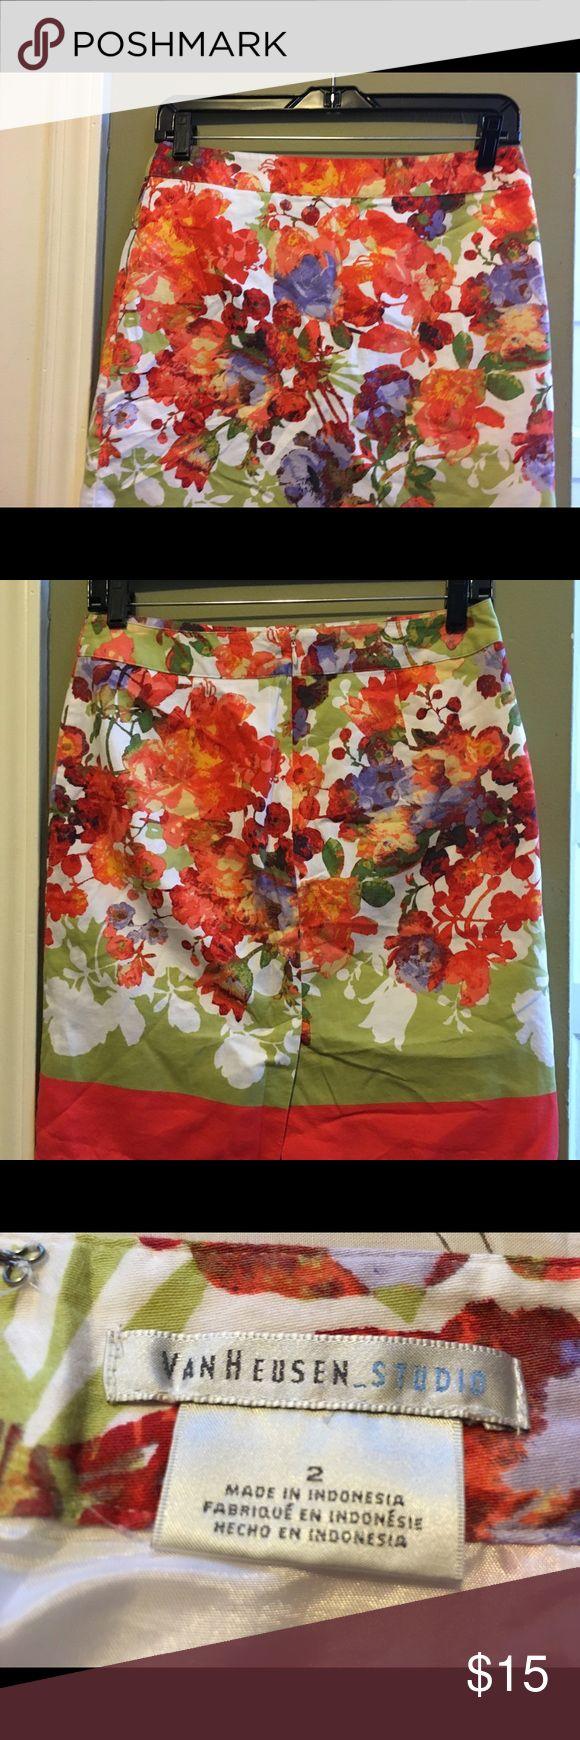 Van Heusen Studio SKIRT Van Heusen Studio Floral Skirt Size 2 Zipper Closure Tube Style Spring / Summer Wear In Excellent Condition Smoke Free Home Van Heusen Skirts Mini